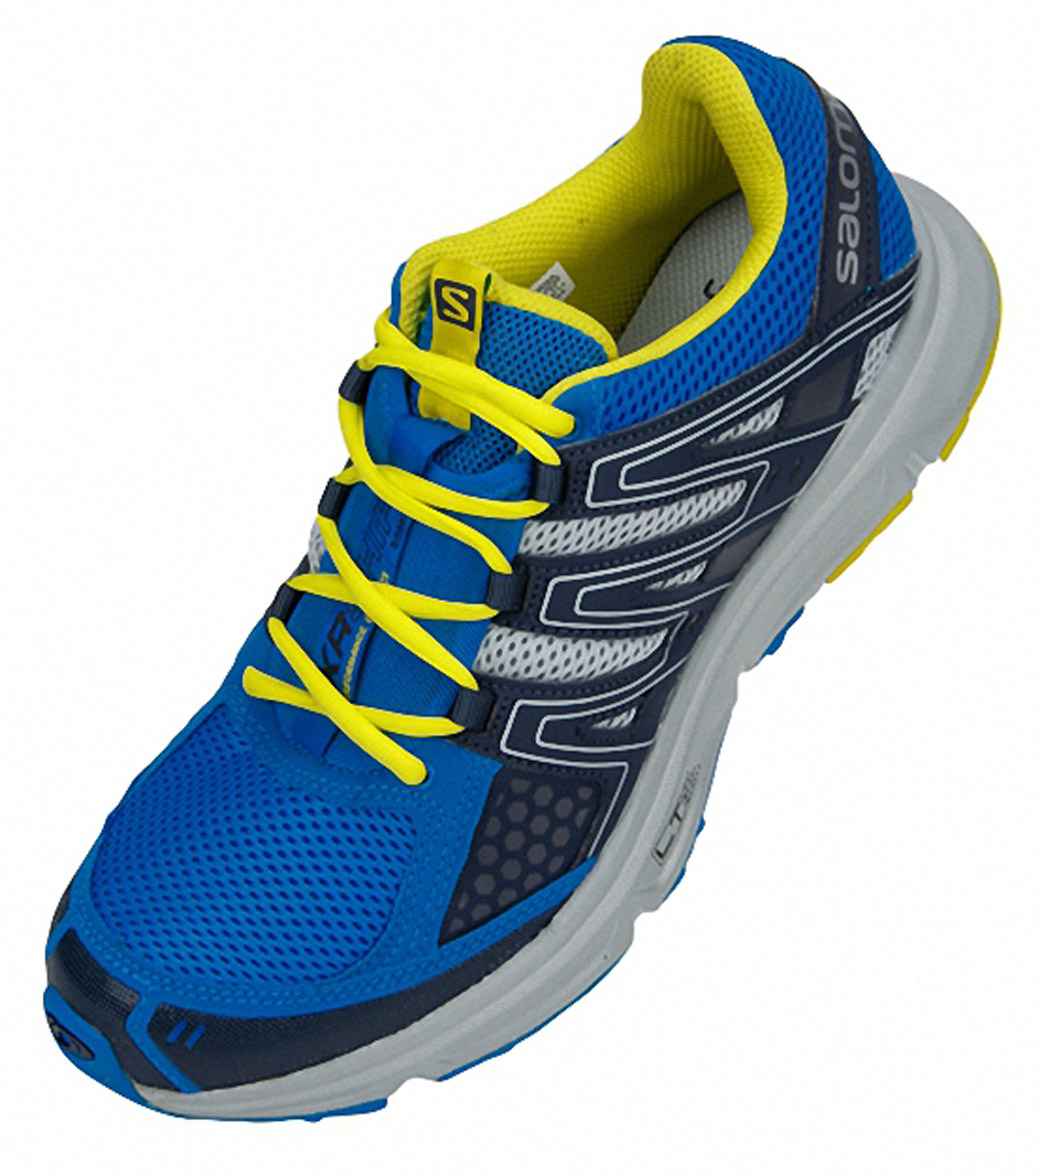 Salomon Free Shift Shoes Men's Running At Xr Trail J1lcFK